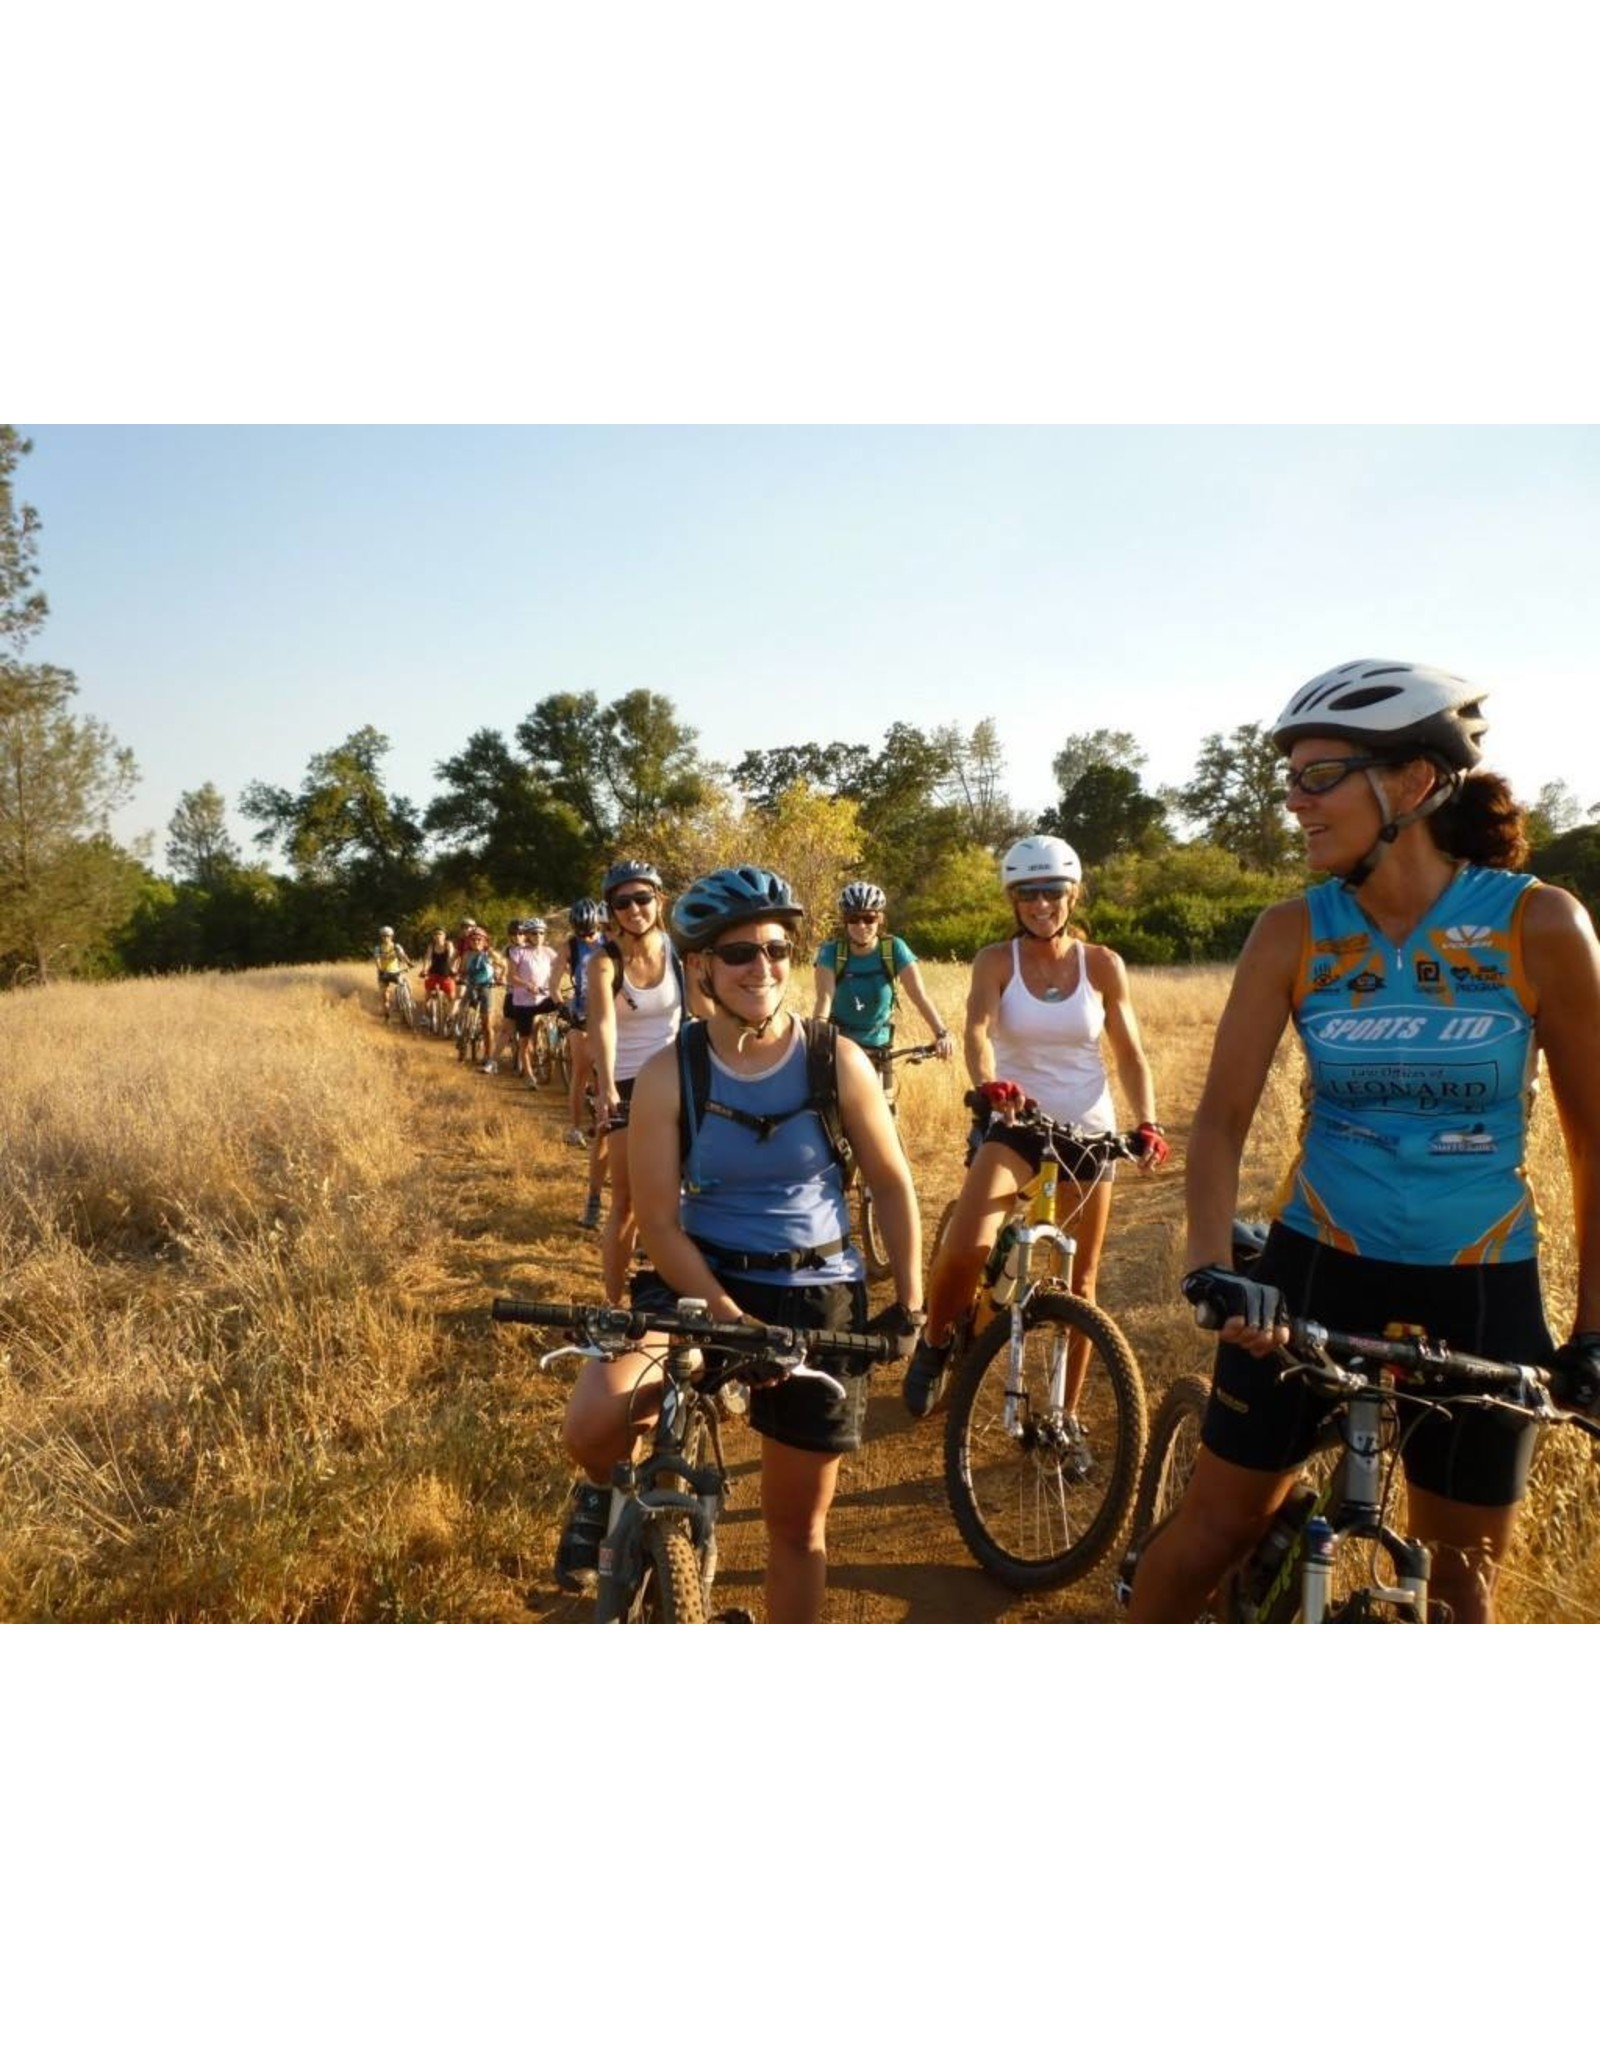 Women's Only Mountain Bike Clinic June 29th